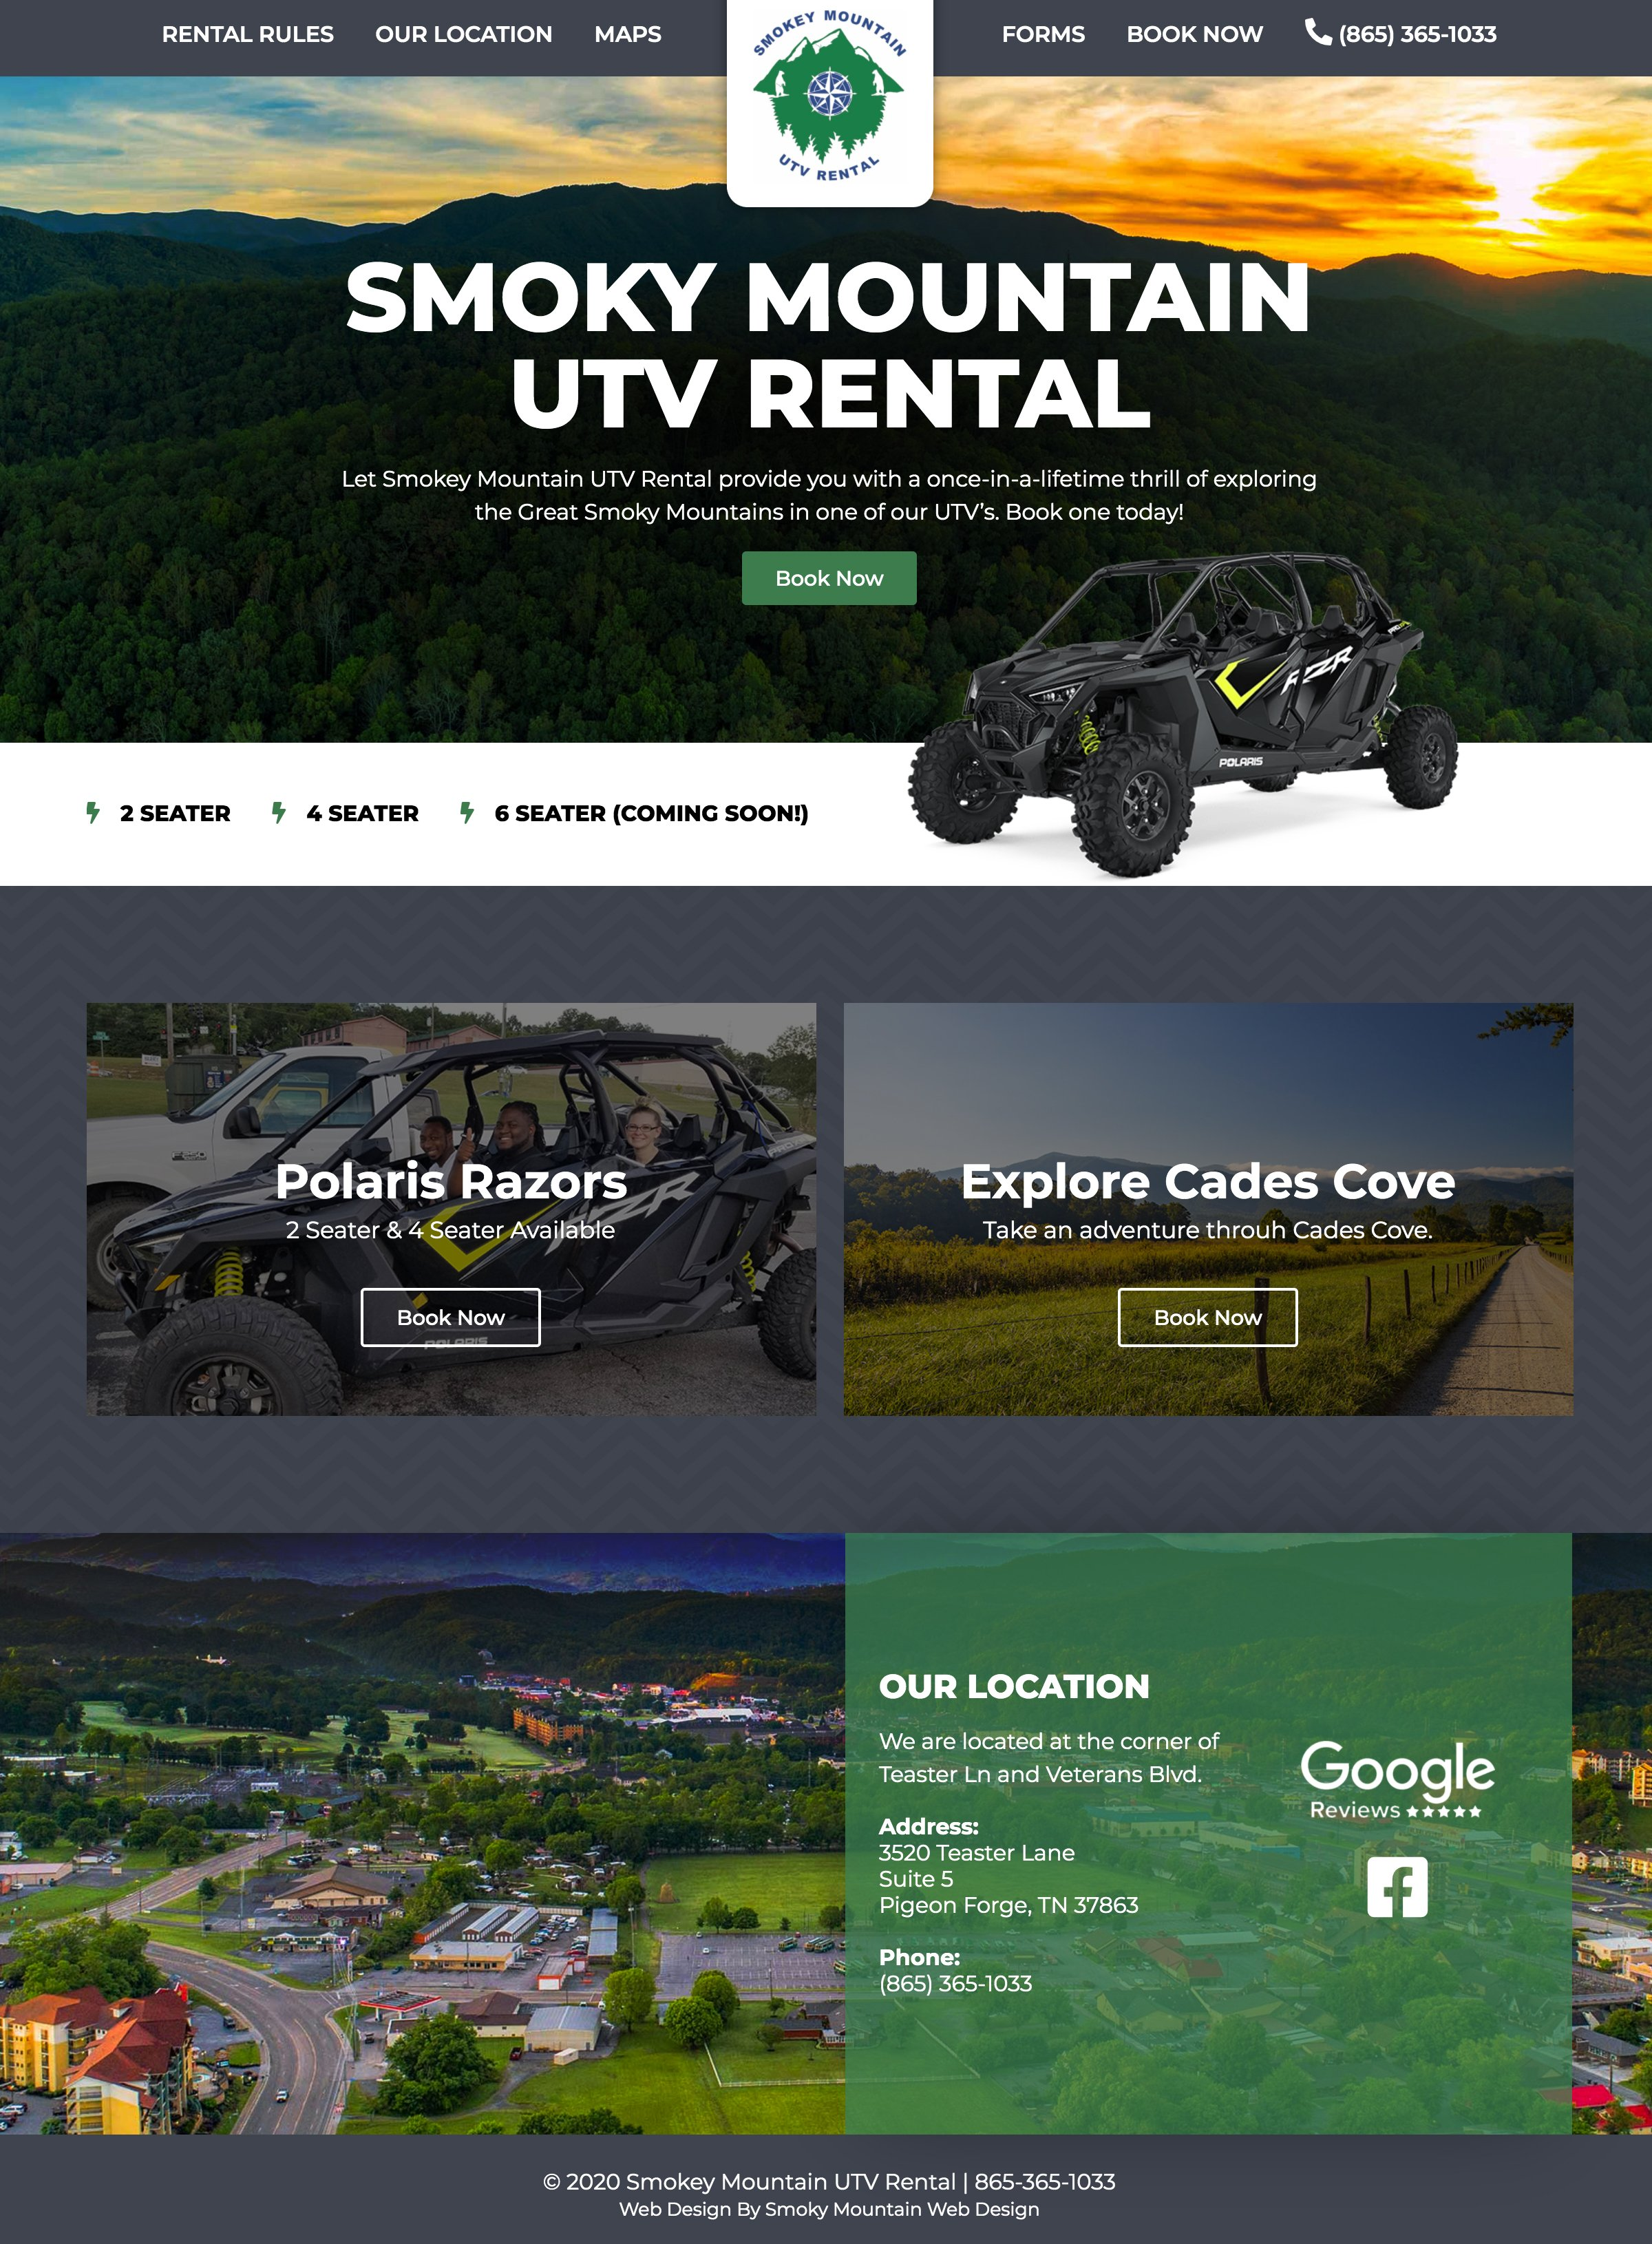 Smokey Mountain UTV Rental